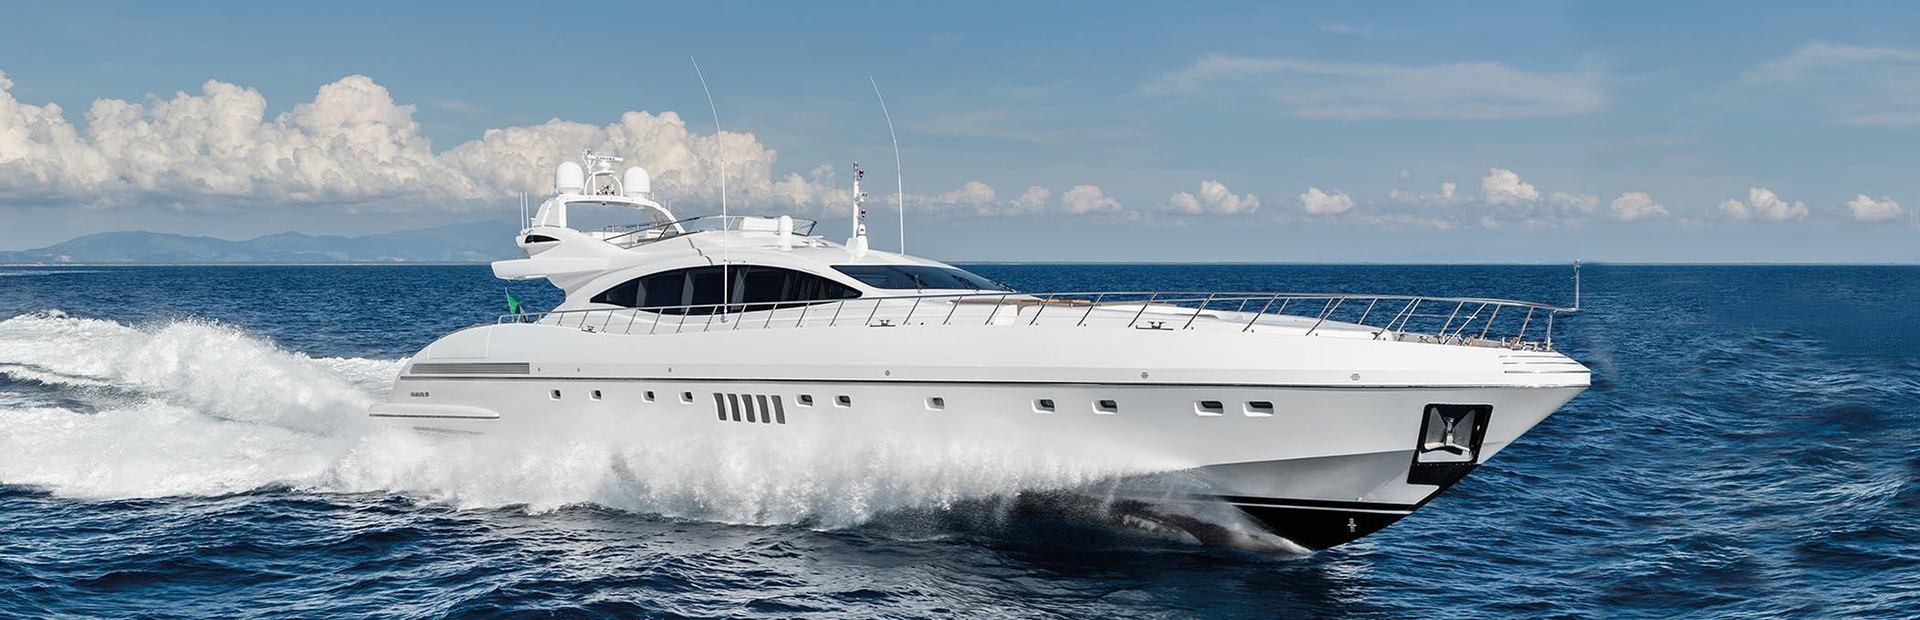 Mangusta 132 Yacht Charter